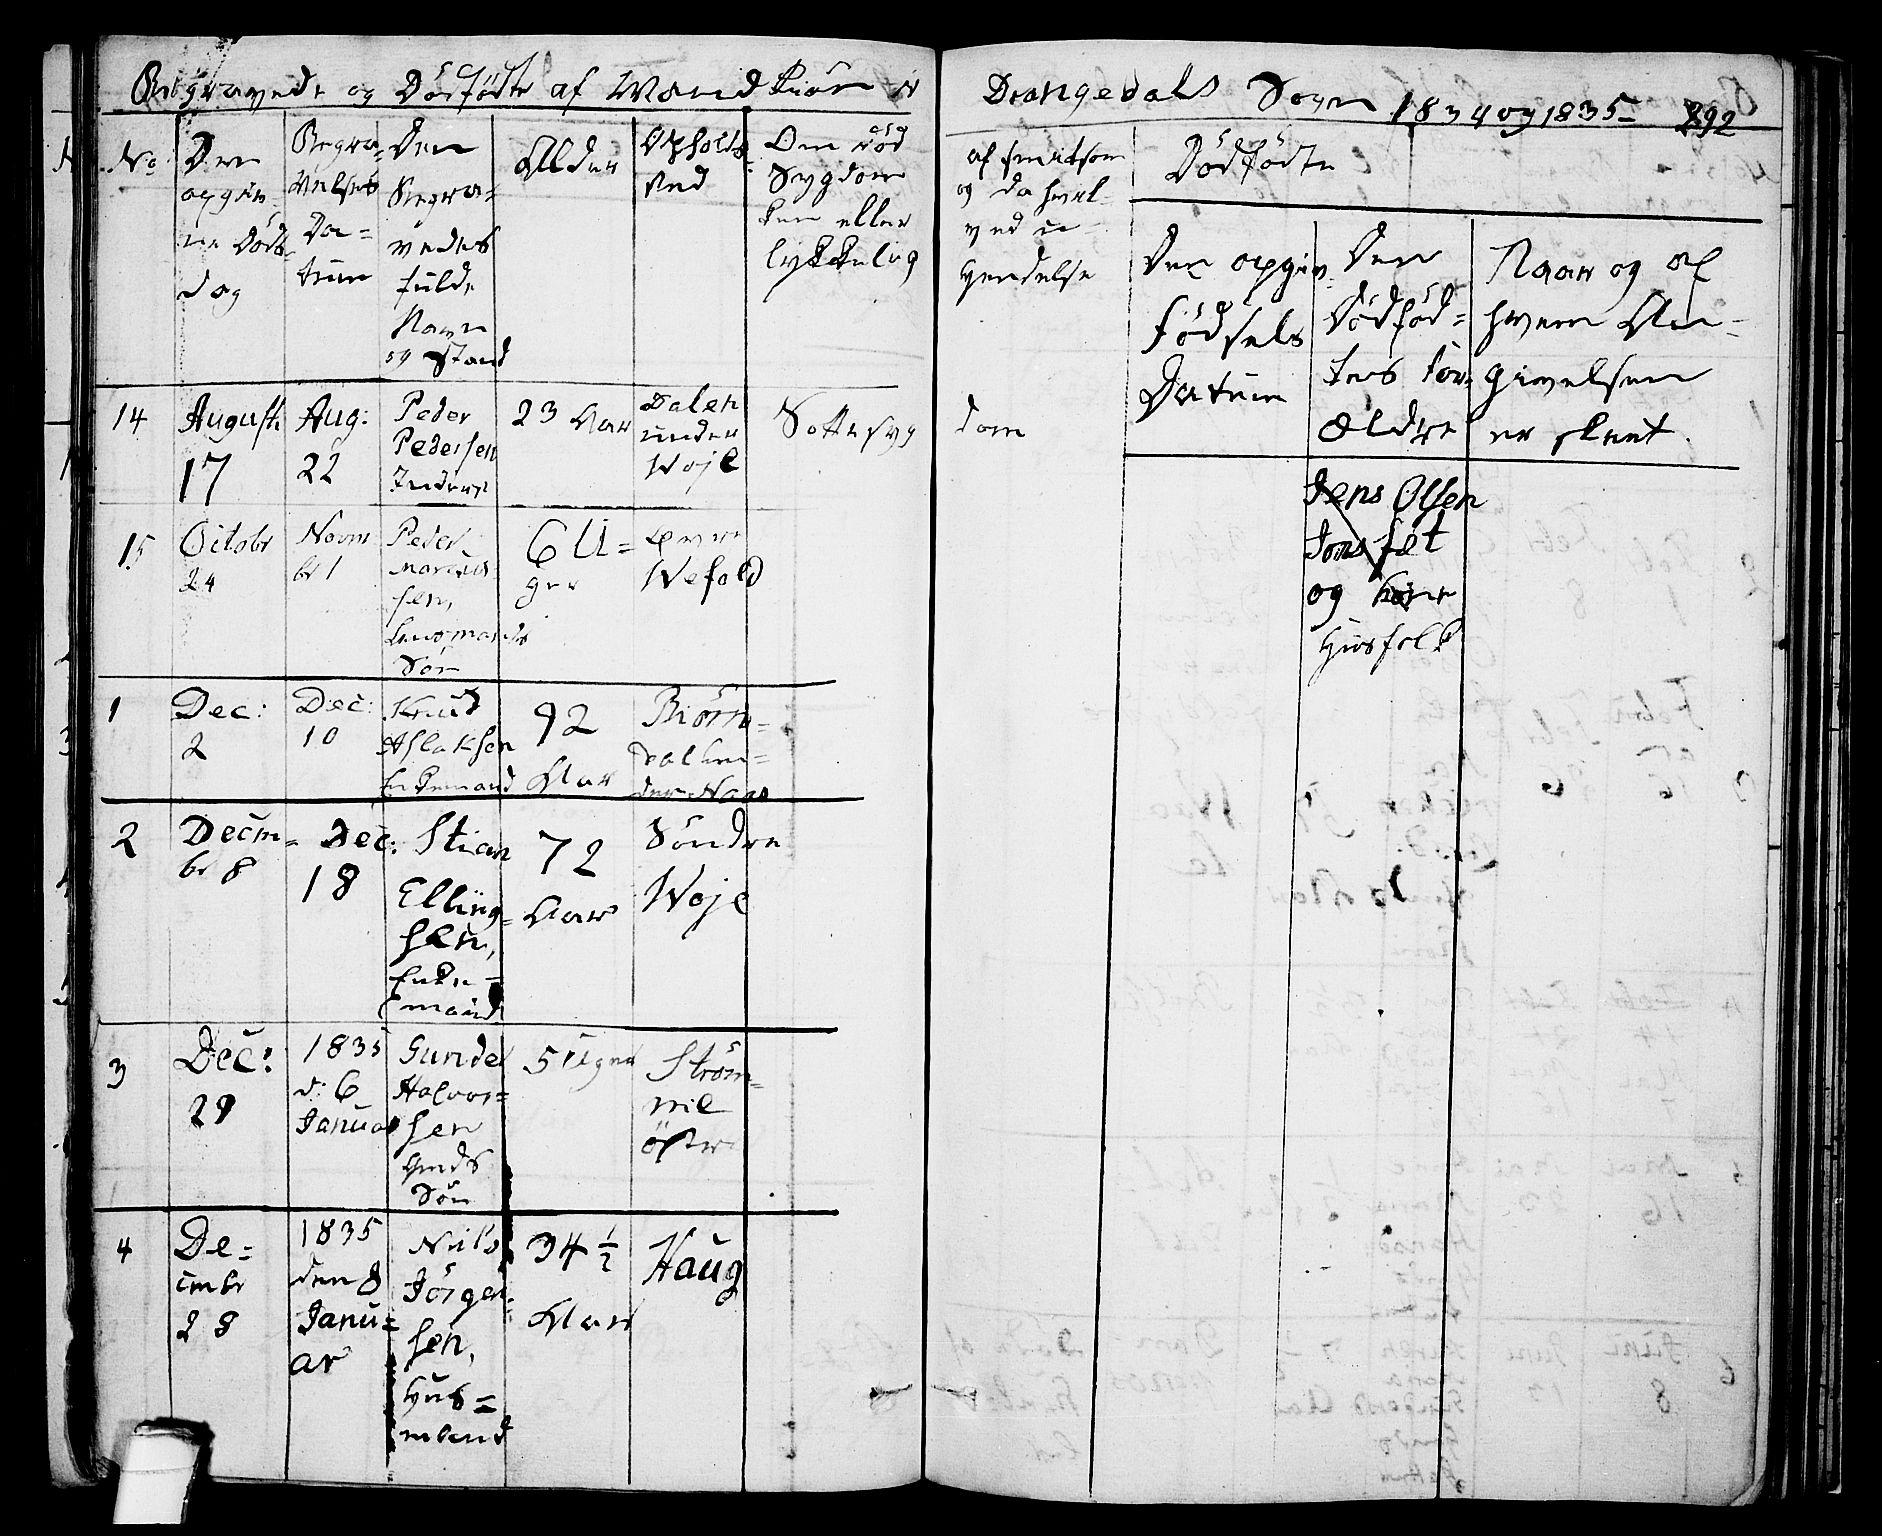 SAKO, Drangedal kirkebøker, F/Fa/L0006: Ministerialbok nr. 6, 1831-1837, s. 292